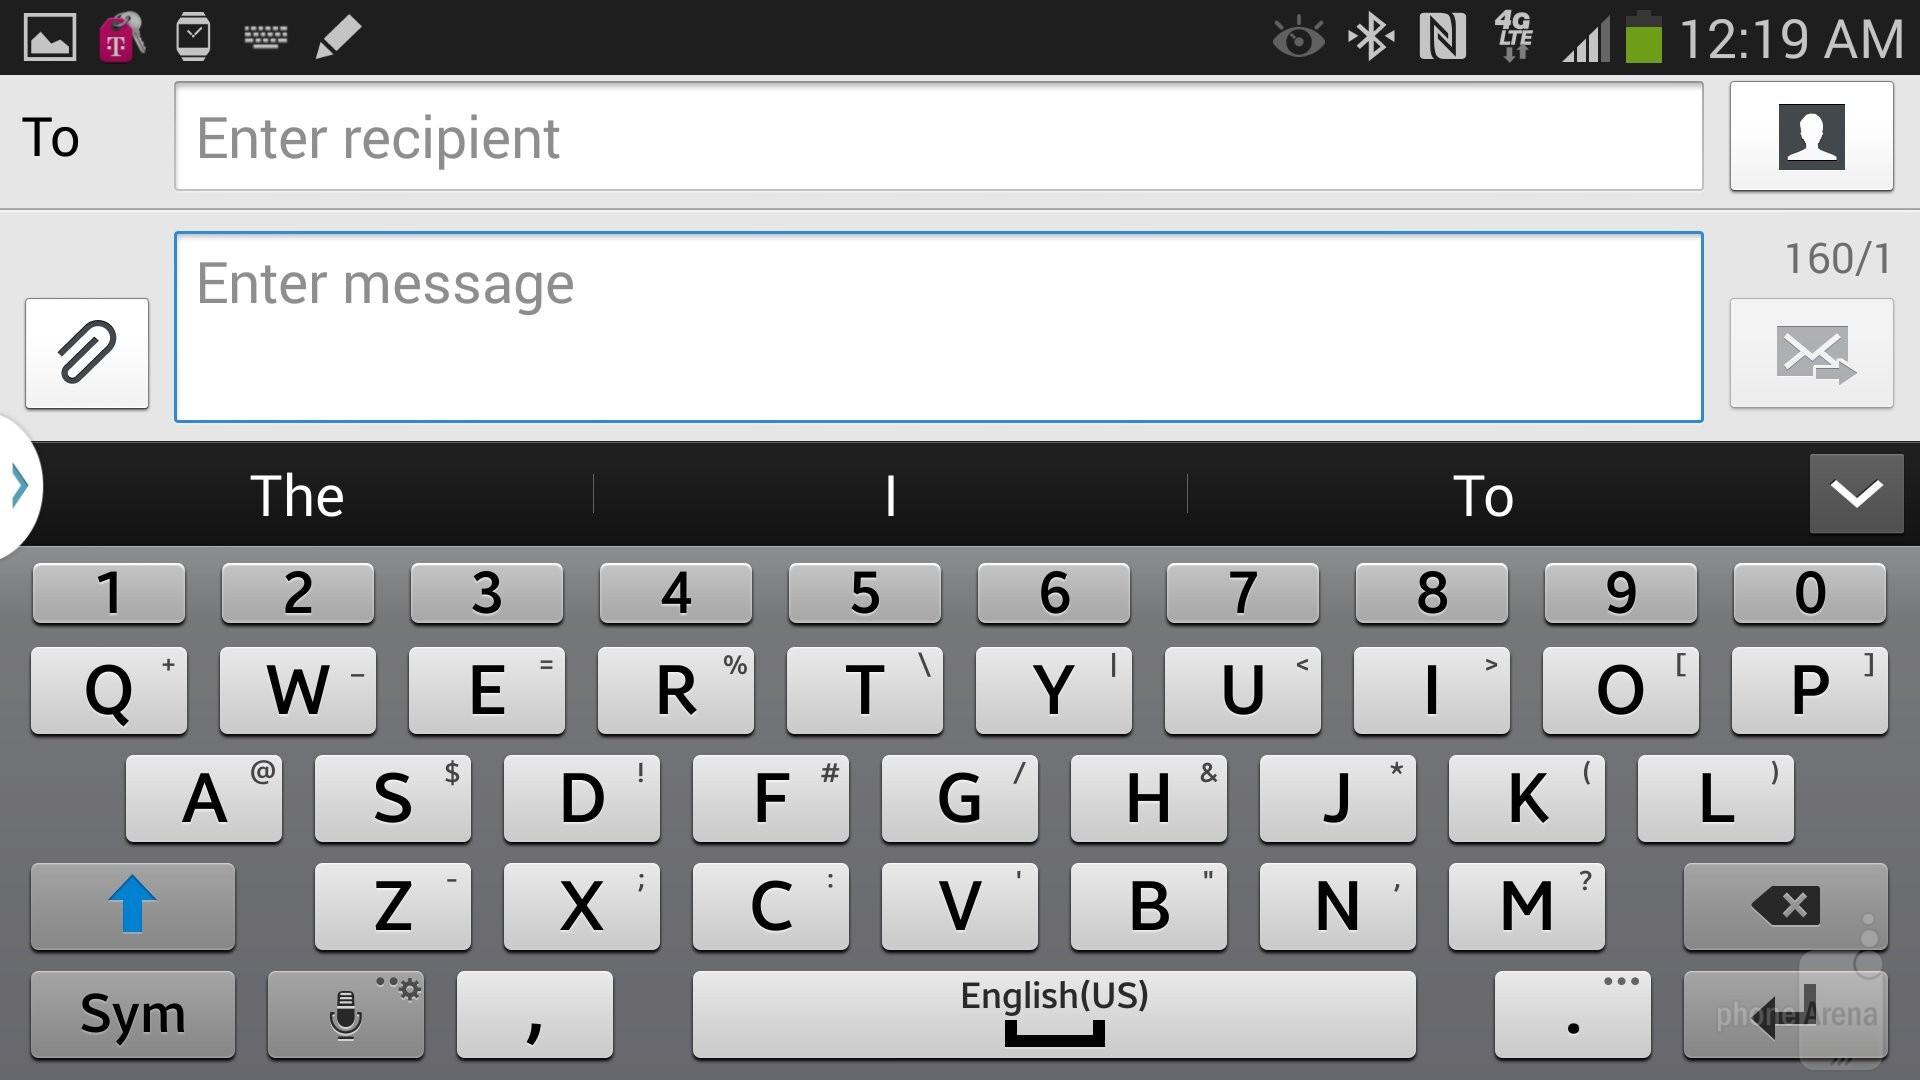 how to make samsung keyboard alwsys on